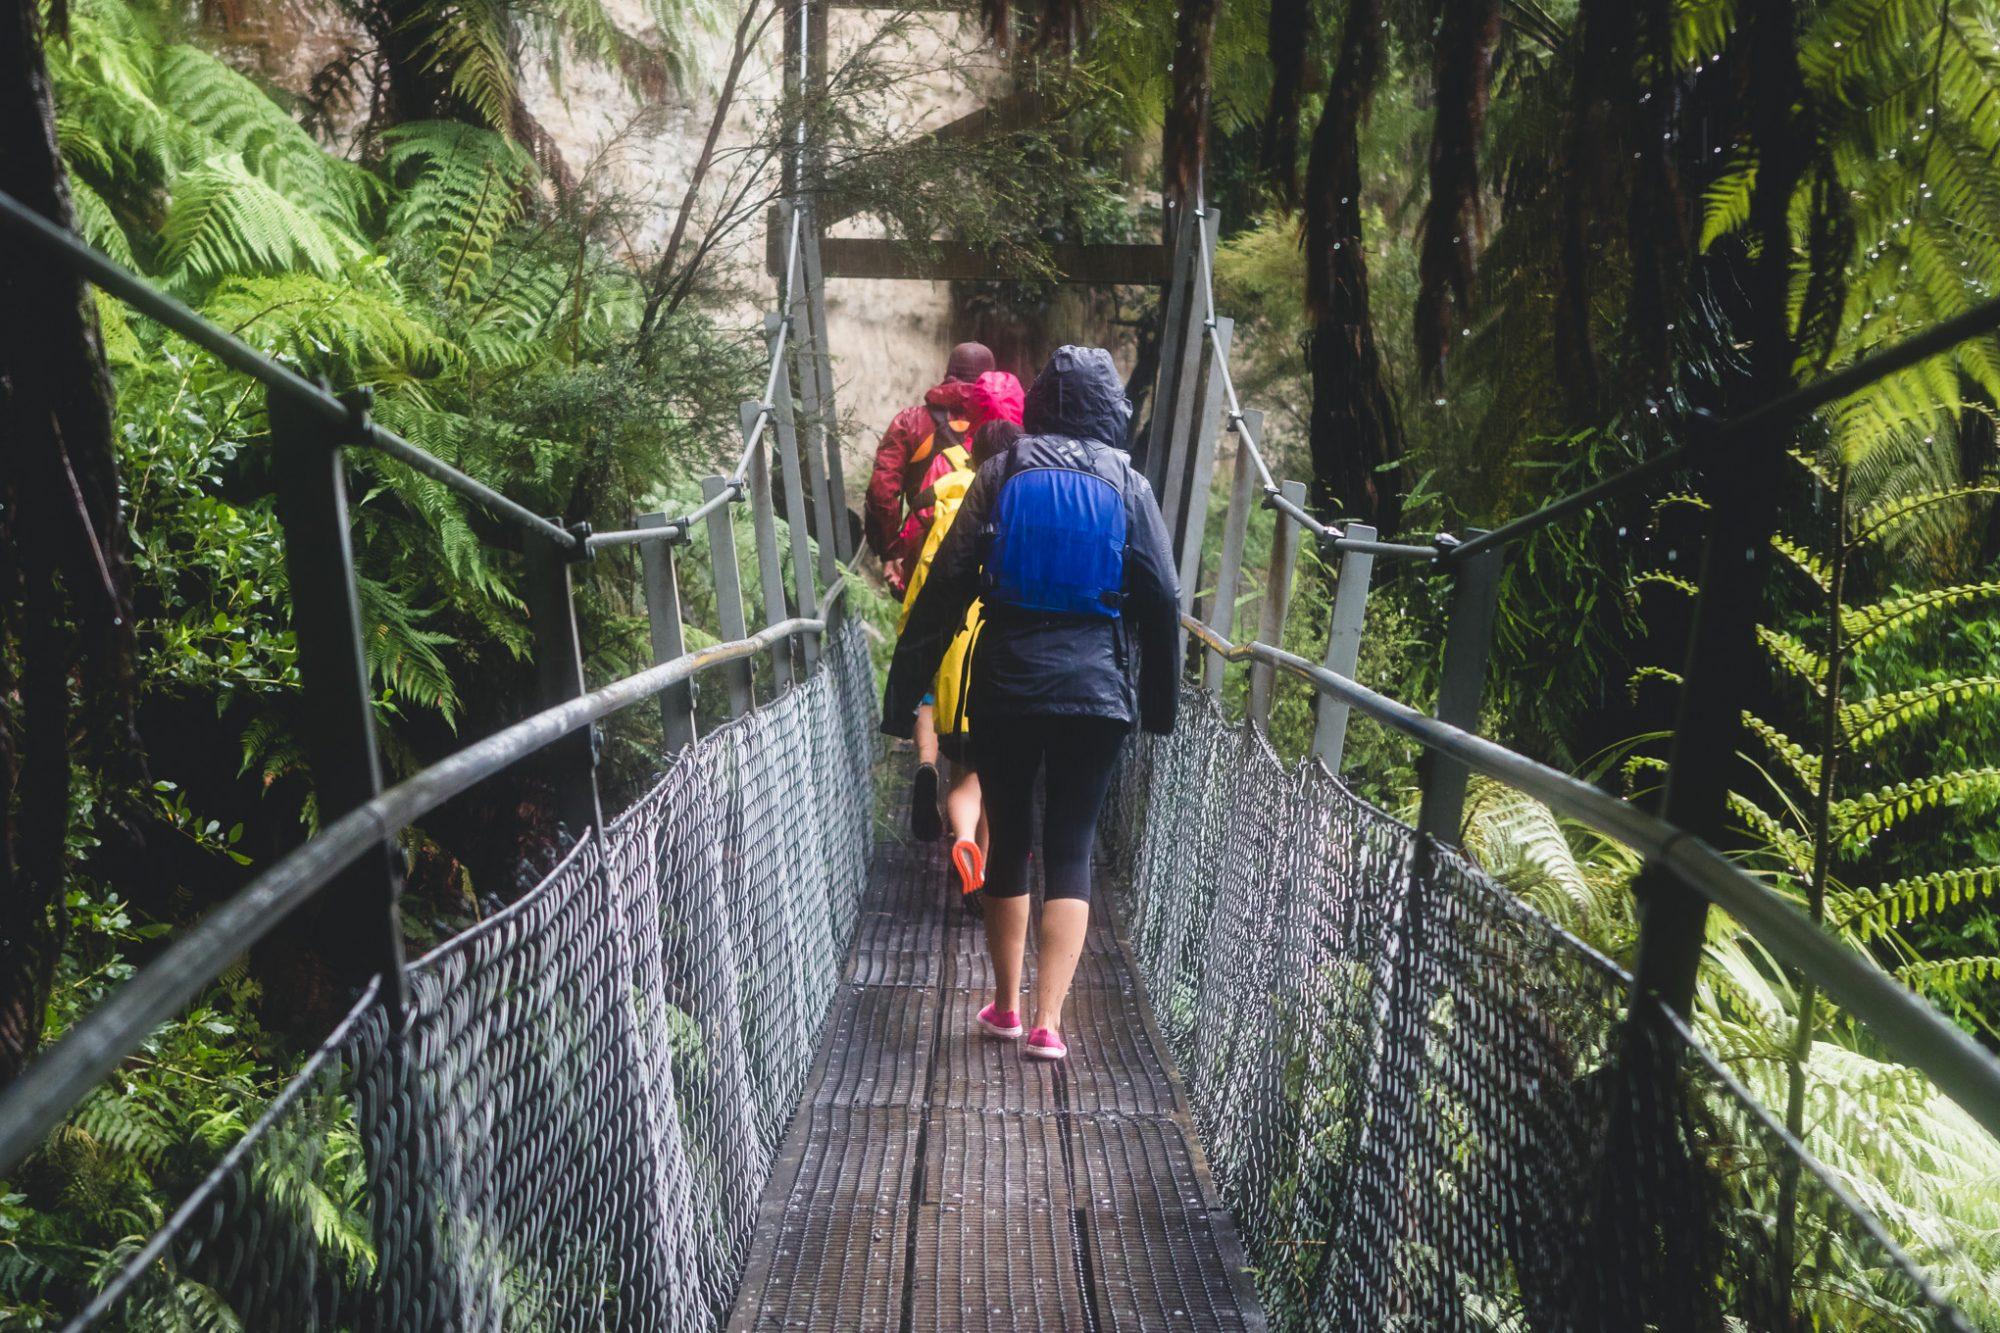 Canoe Safaris Whangarei Falls Pipiriki River